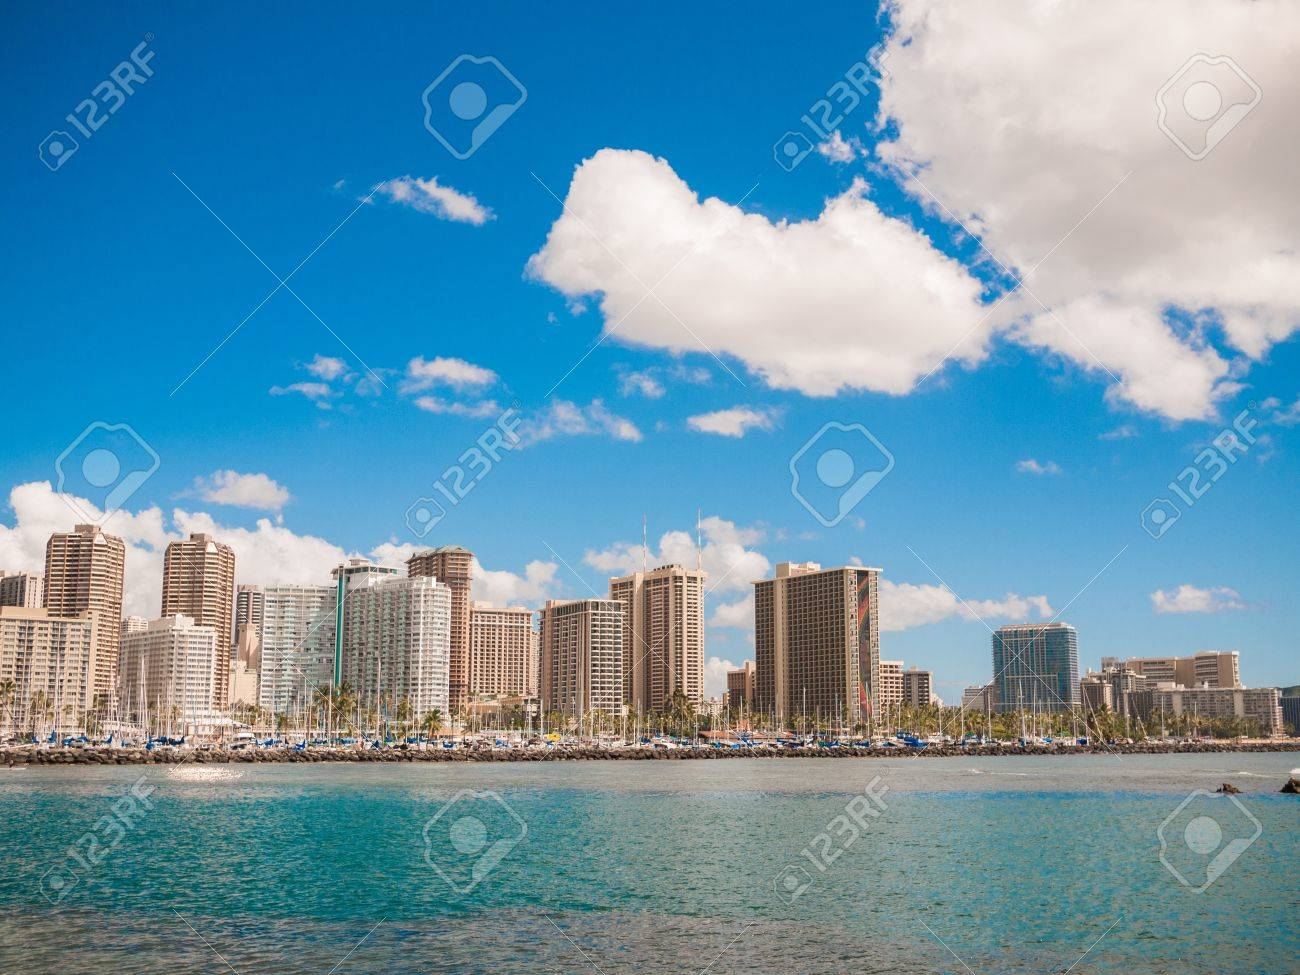 HONOLULU, HAWAII - FEB 2, View of Waikiki Yacht club from Ala Moana beach park with buildings behind Stock Photo - 14916005